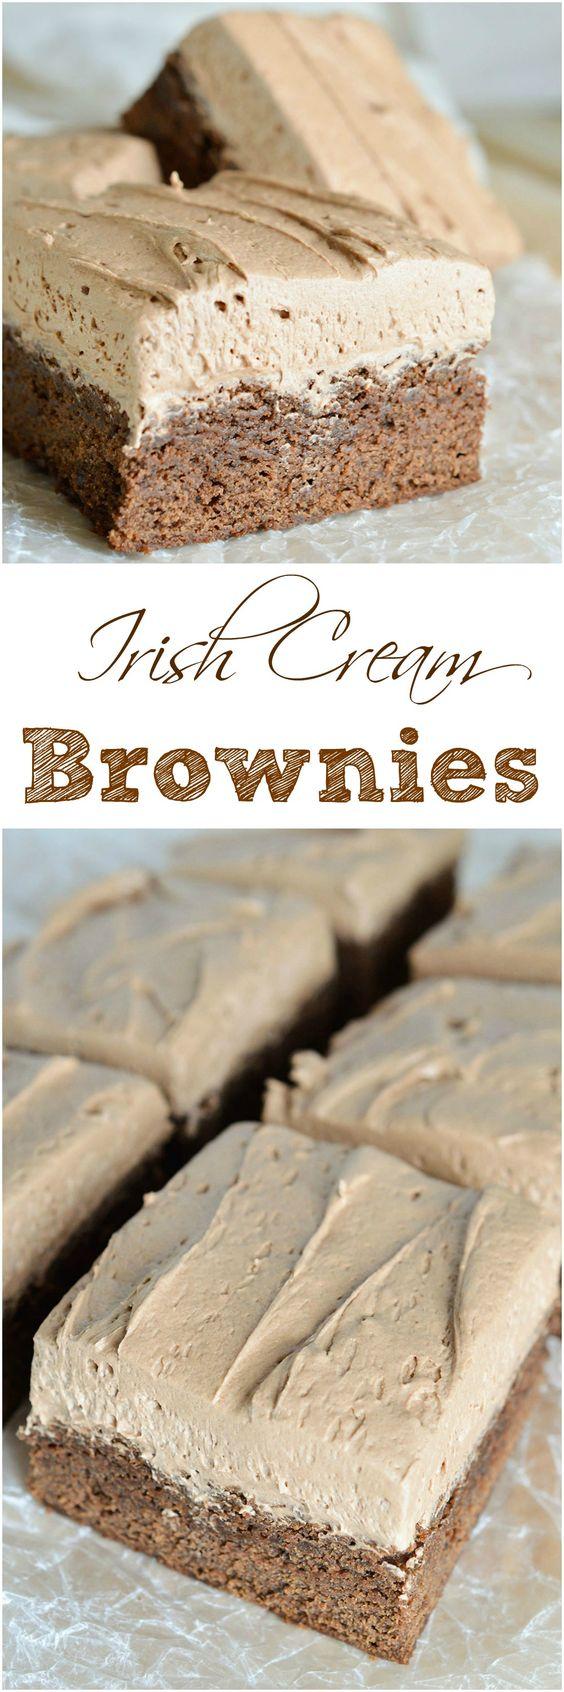 Moist cake like chocolate brownies topped with decadent chocolate Irish Cream frosting.